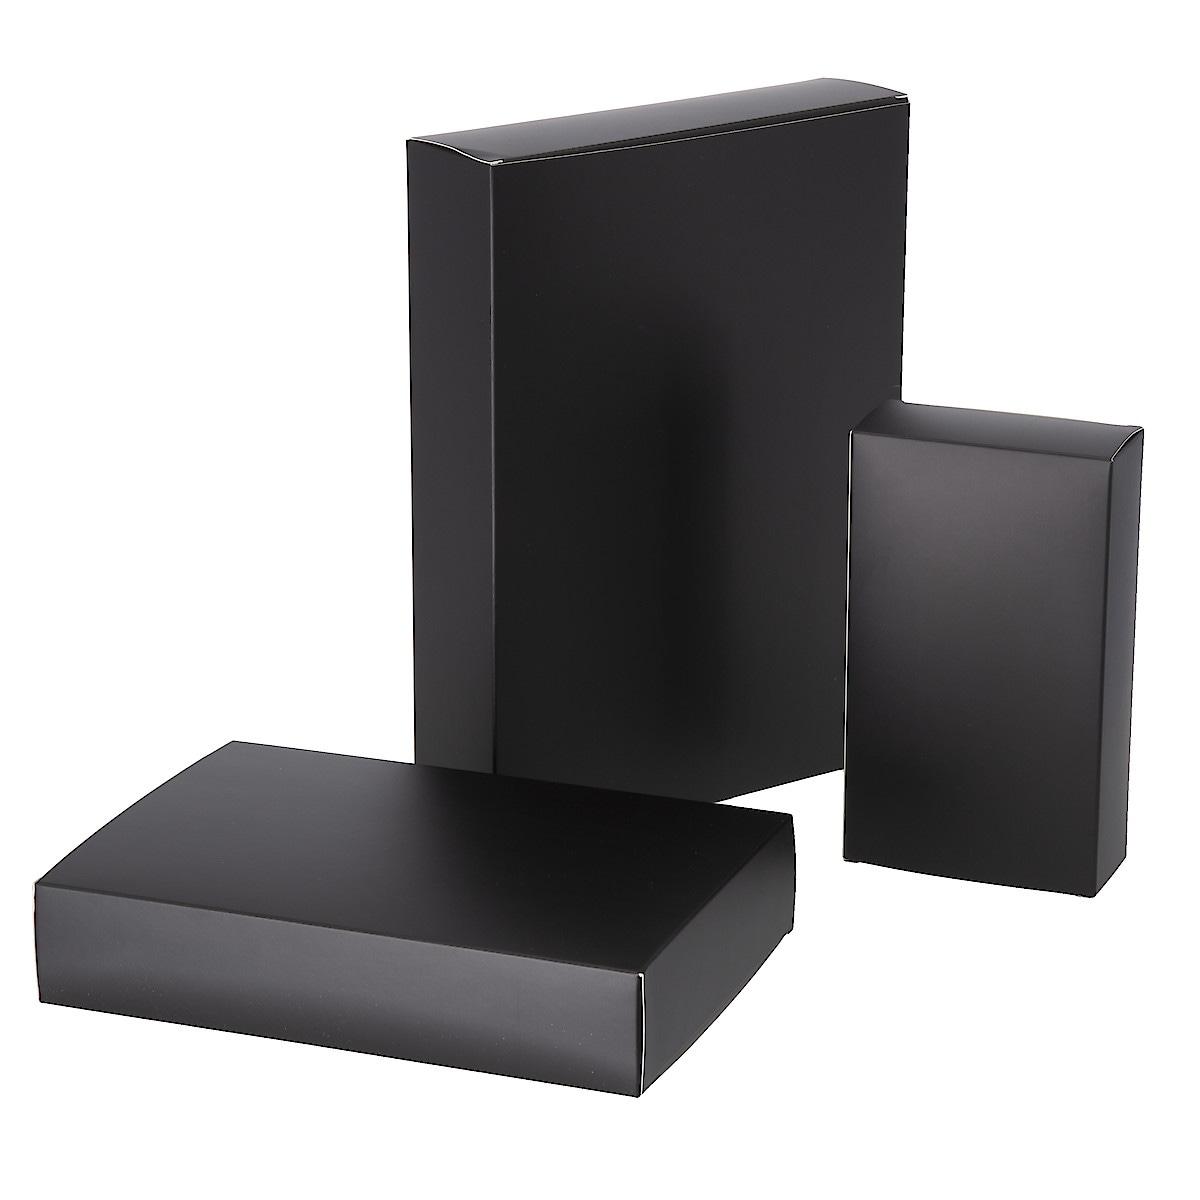 Lahjapakkaus 3 kpl musta